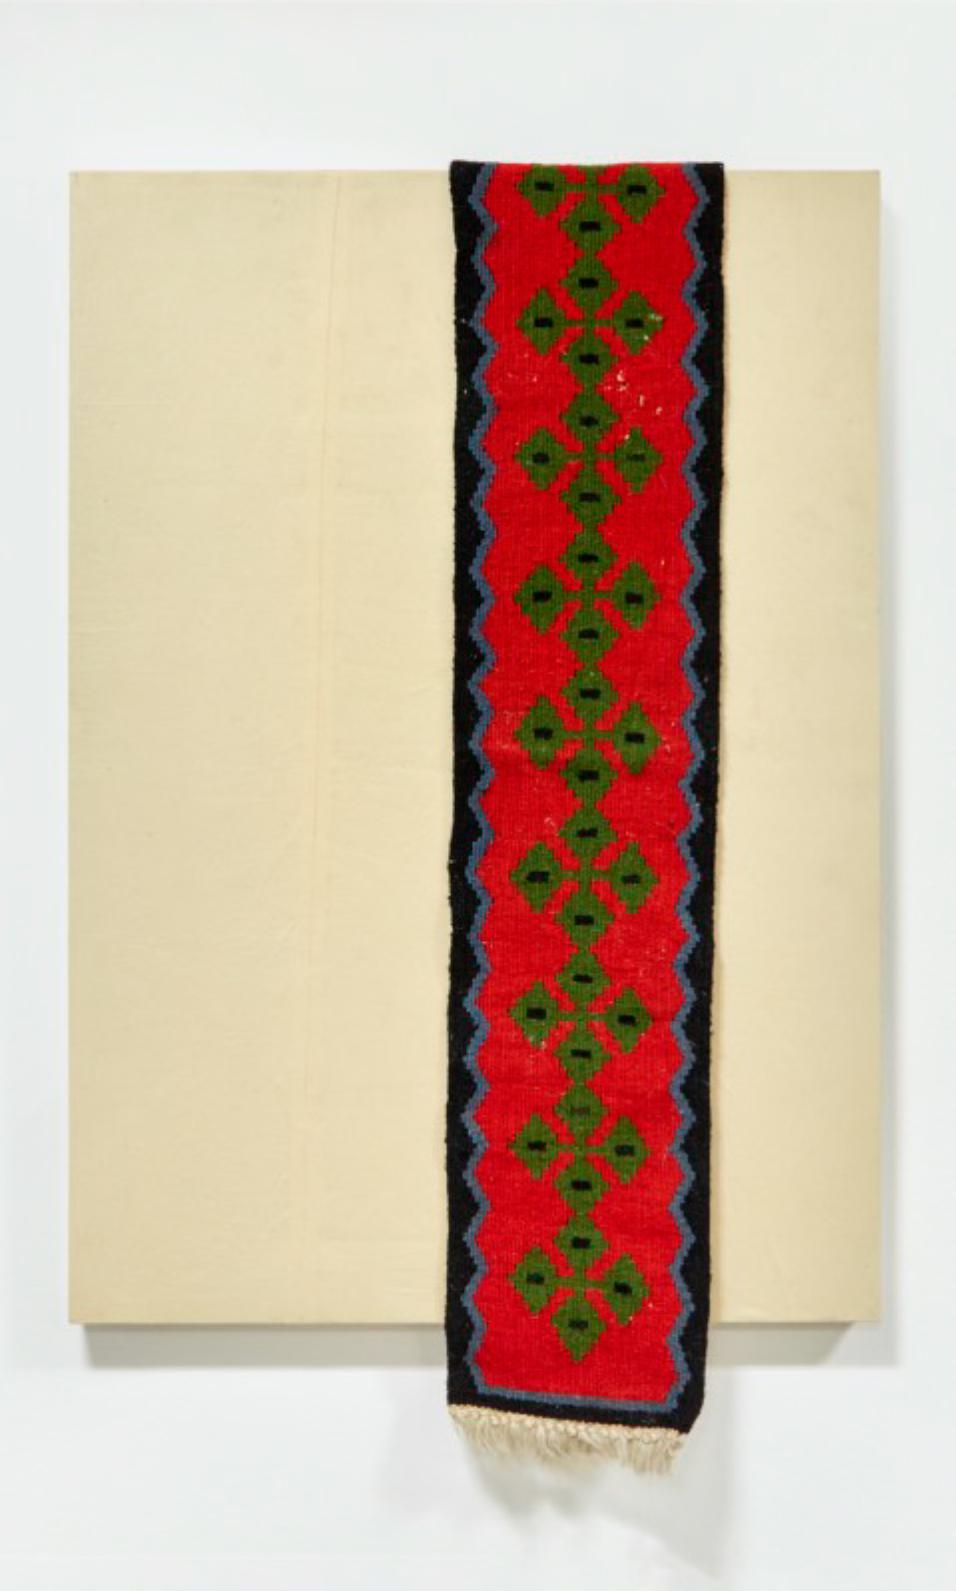 Identity Pick n' Mix II, 2021, woven kilim, cotton, rabbit skin glue, on wood, 70 x 100 cm